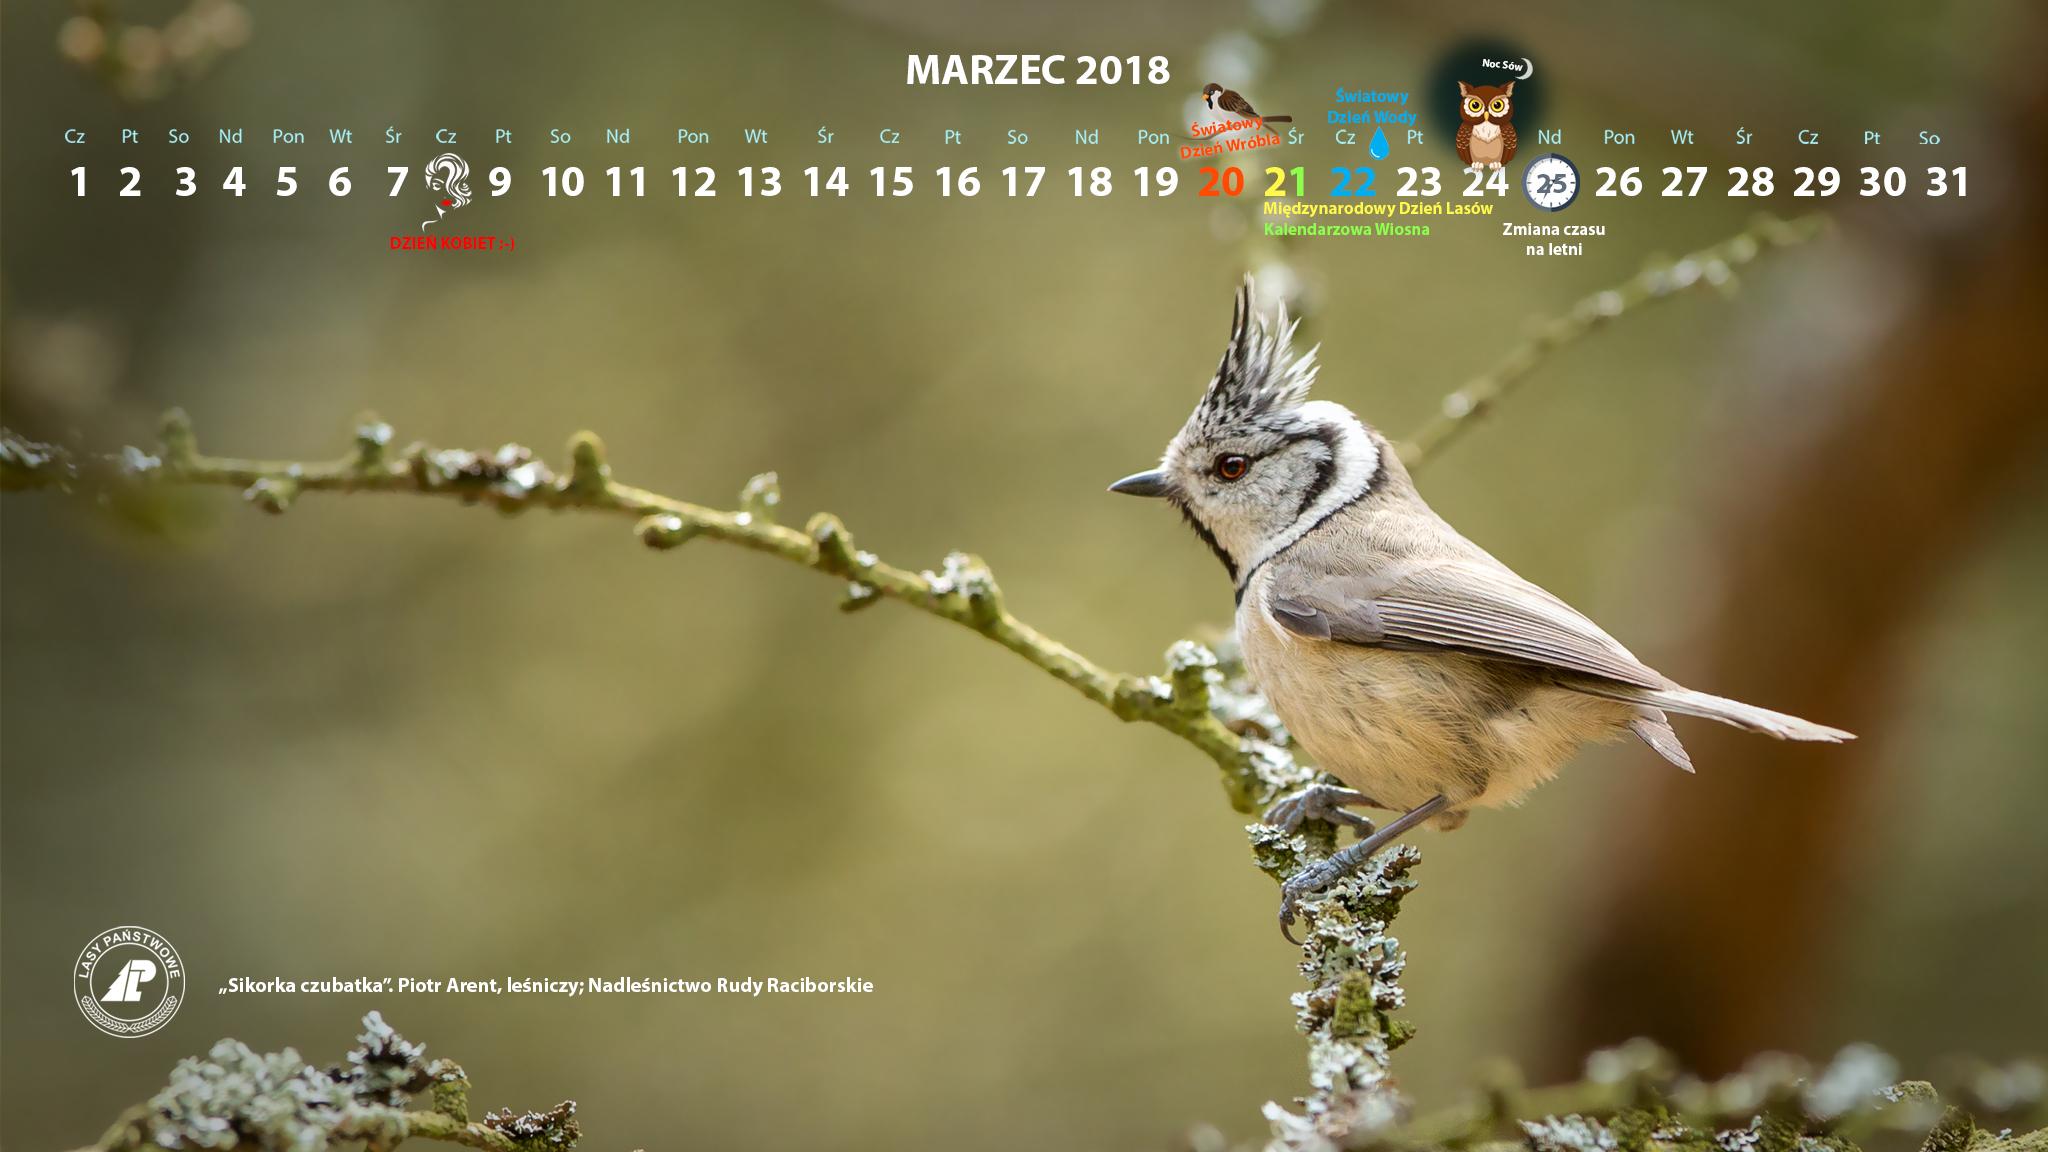 Kalendarz_MARZEC_2018_2048x1152[1].jpg